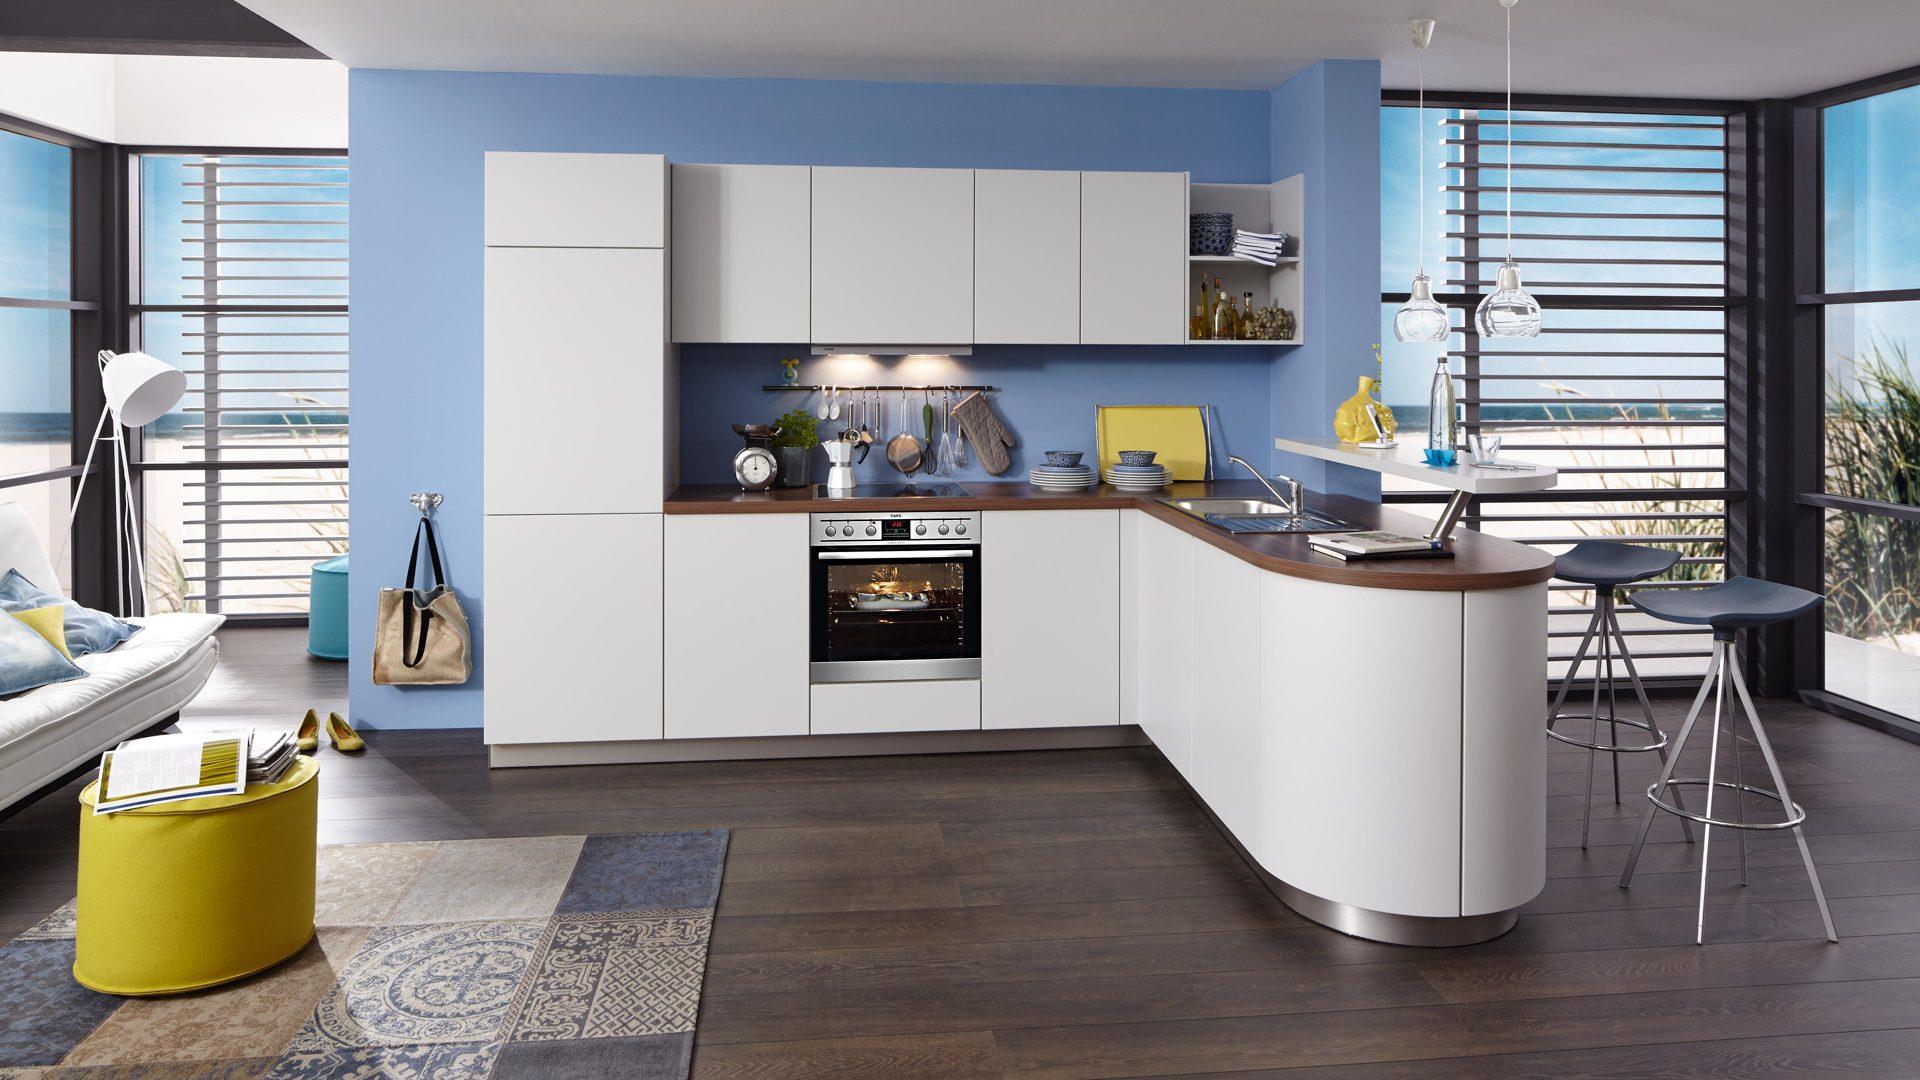 Einbauküchen mit elektrogeräten  Möbel Bohn Crailsheim, Möbel A-Z, Küchen, Einbauküchen, Einbauküche ...